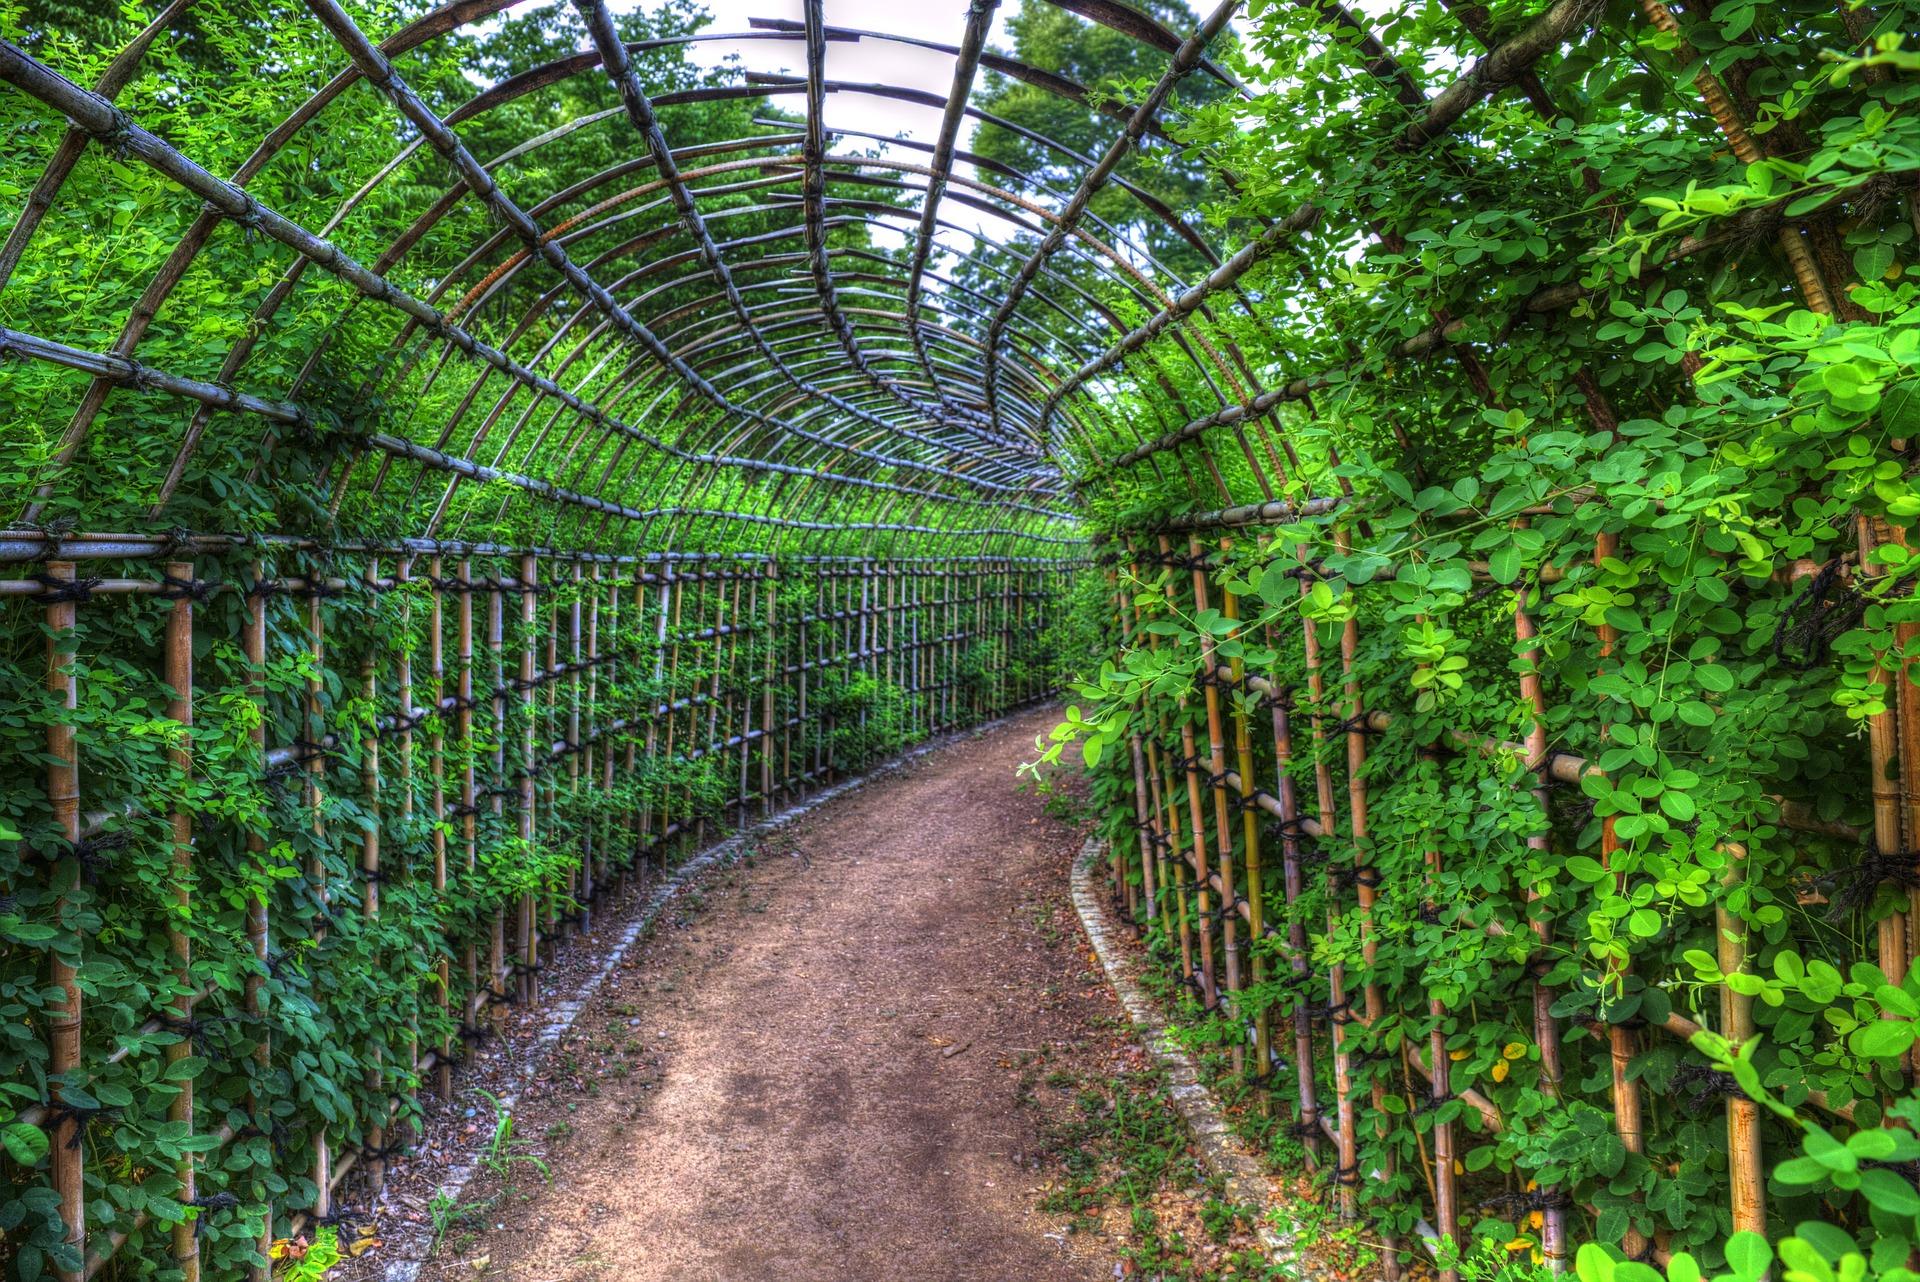 """ Tunnels, flowers, park, future "" by  大屋 開拓  is  Public Domain ."